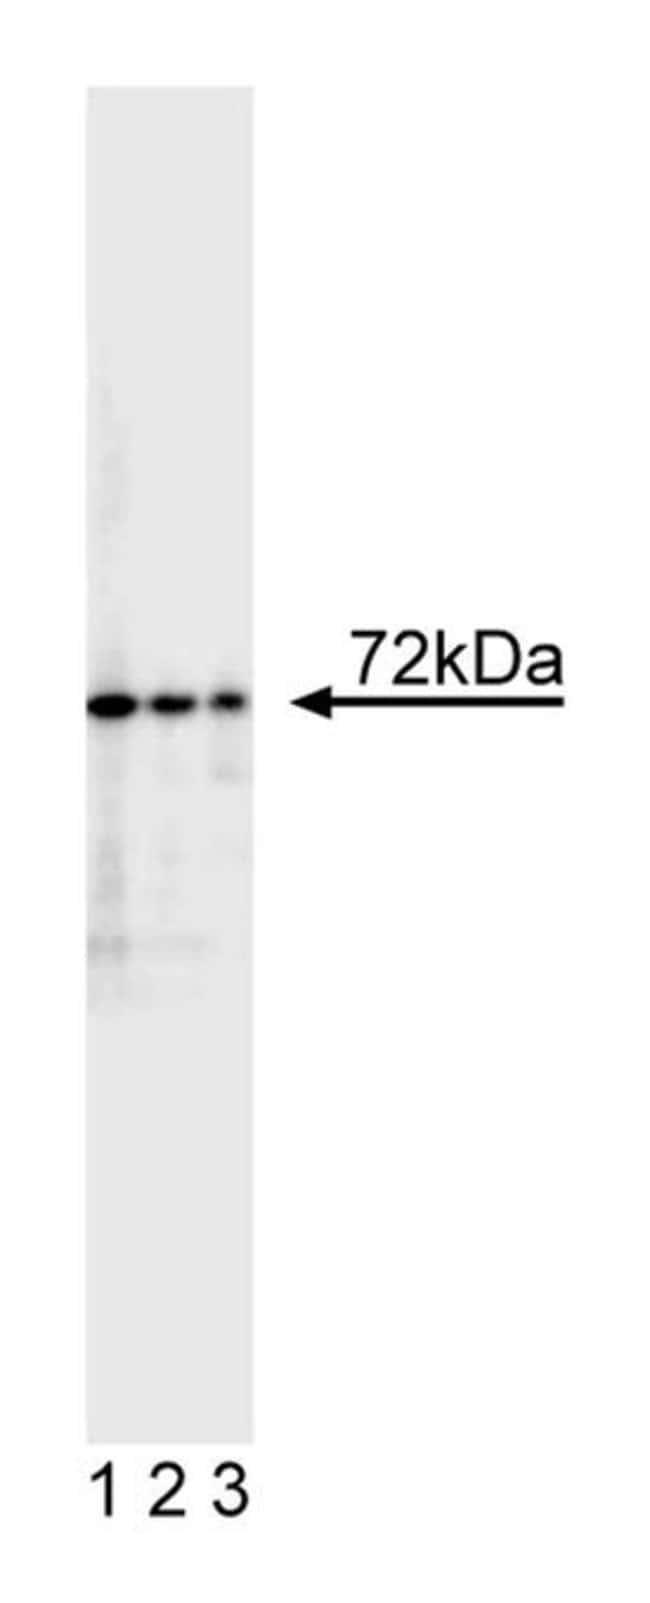 c-IAP-2 w/contol Mouse anti-Human, Unlabeled, Clone: F30-2285, BD 150μg; Unlabeled c-IAP-2 w/contol Mouse anti-Human, Unlabeled, Clone: F30-2285, BD